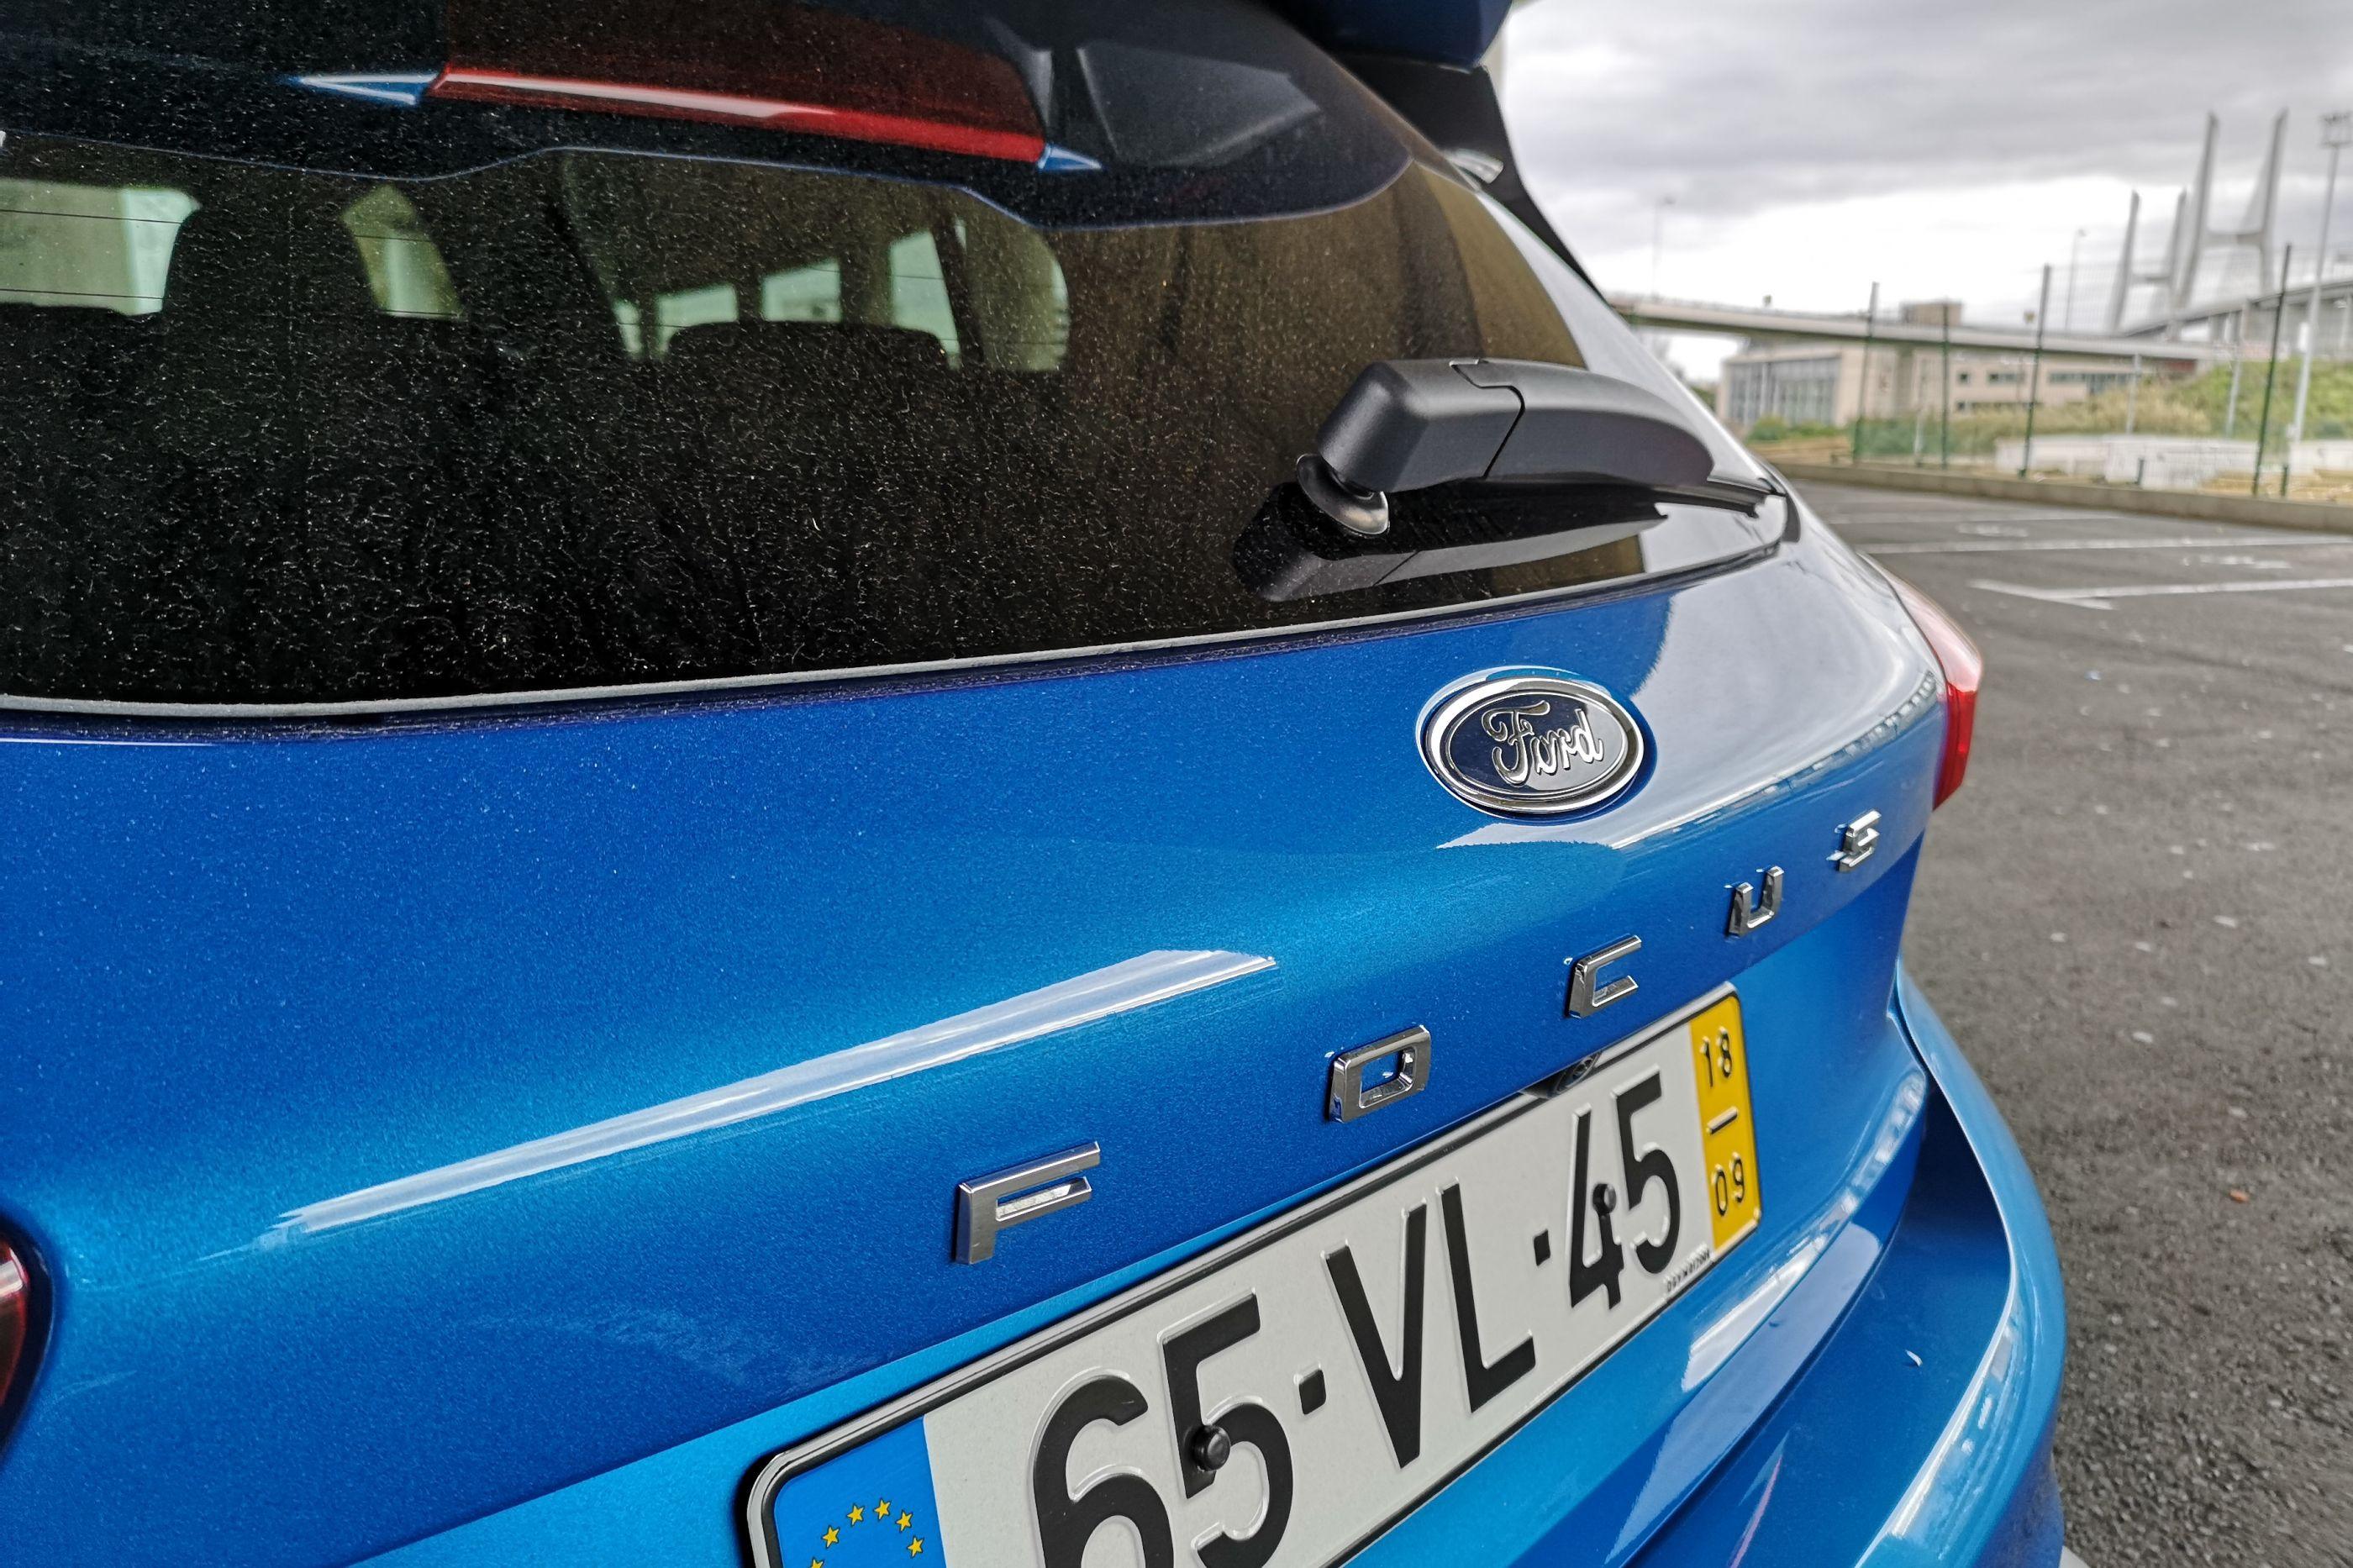 Testámos o novo Ford Focus e o Diesel... ainda está vivo